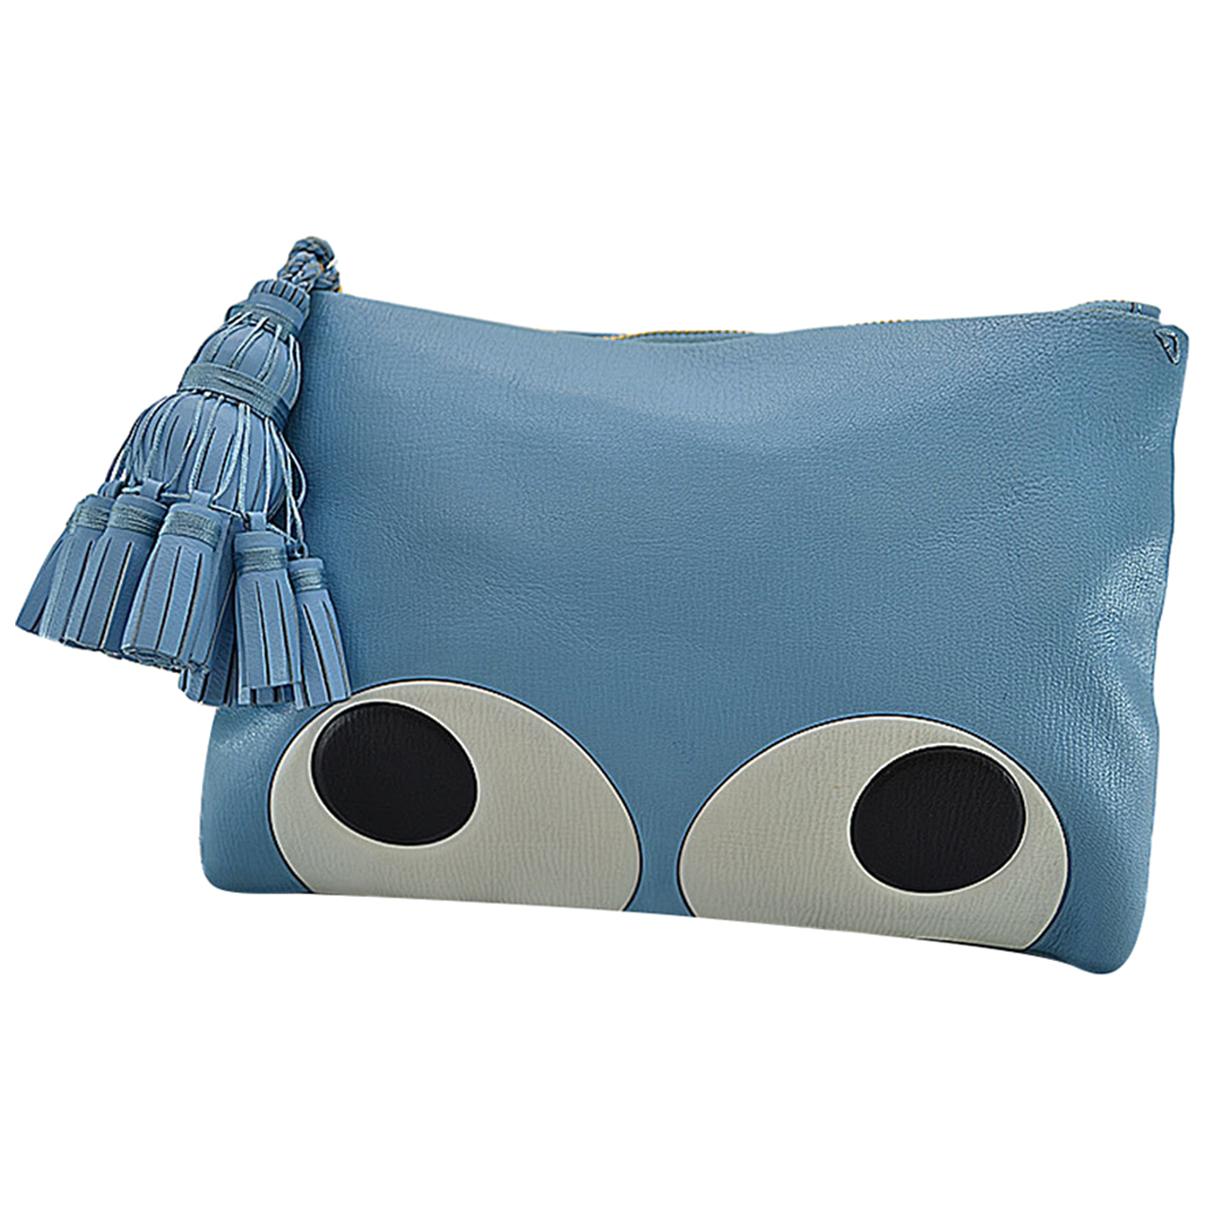 Anya Hindmarch \N Clutch in  Blau Leder